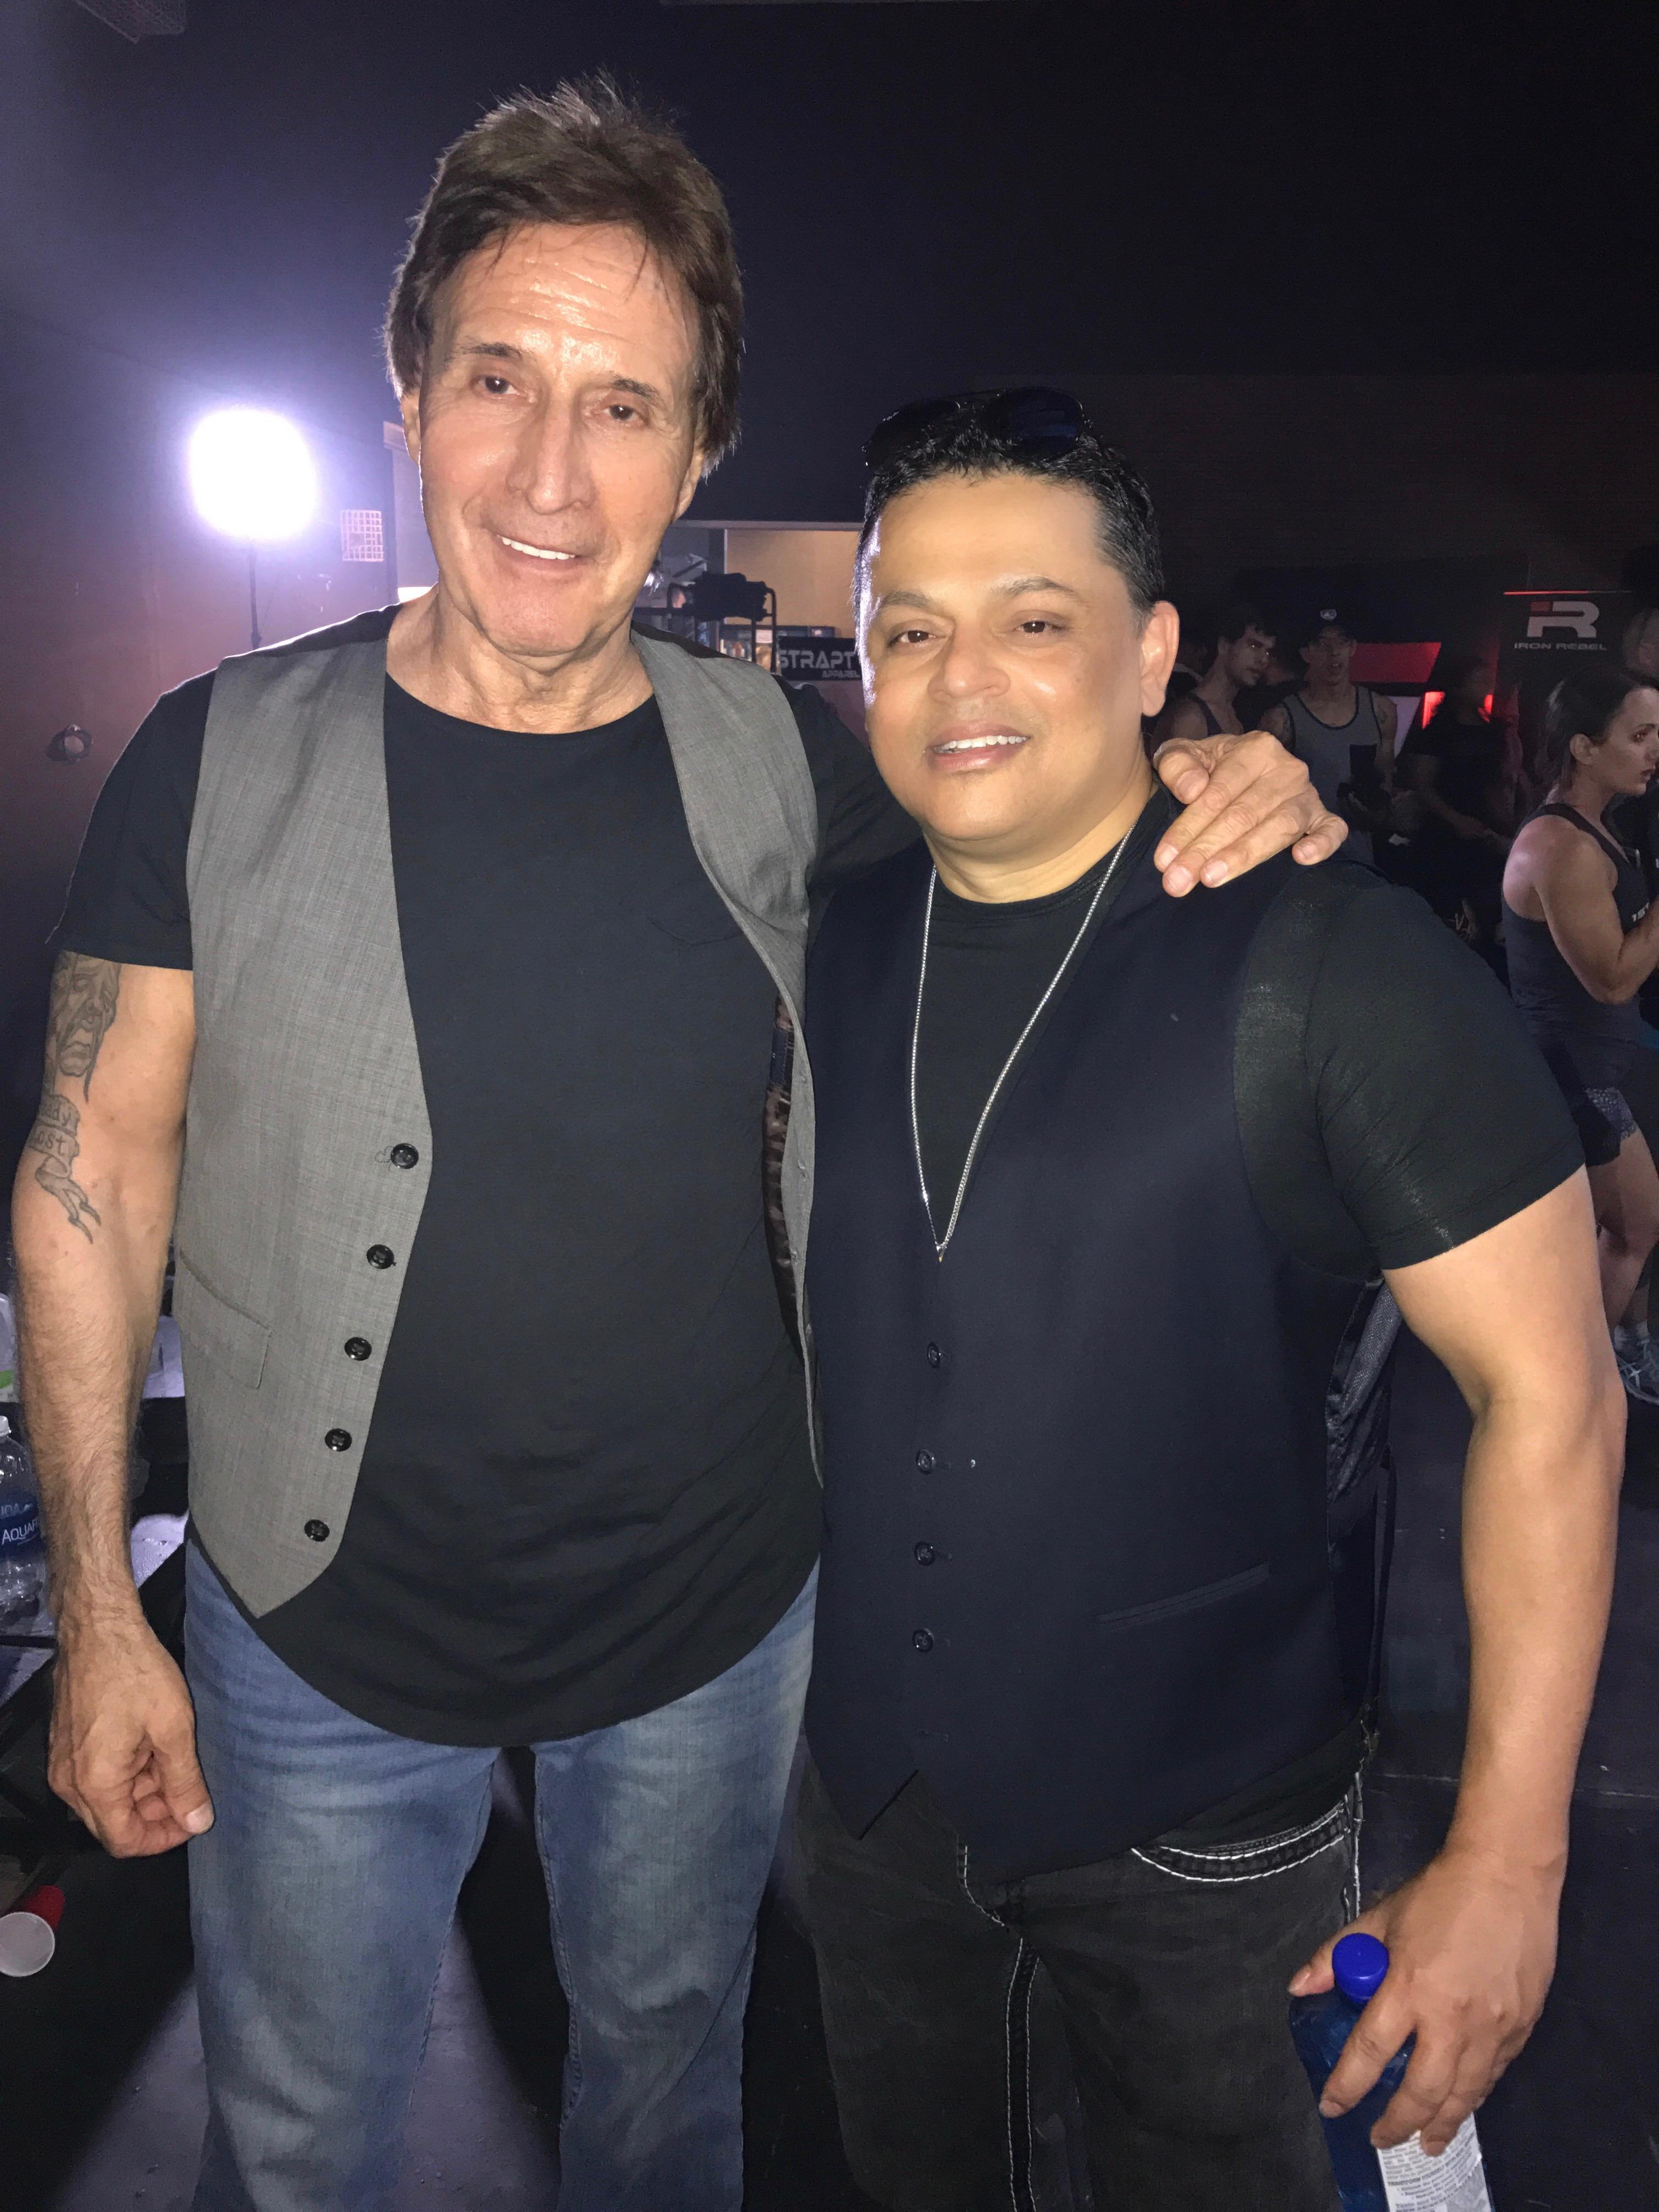 Producer Barry Levine